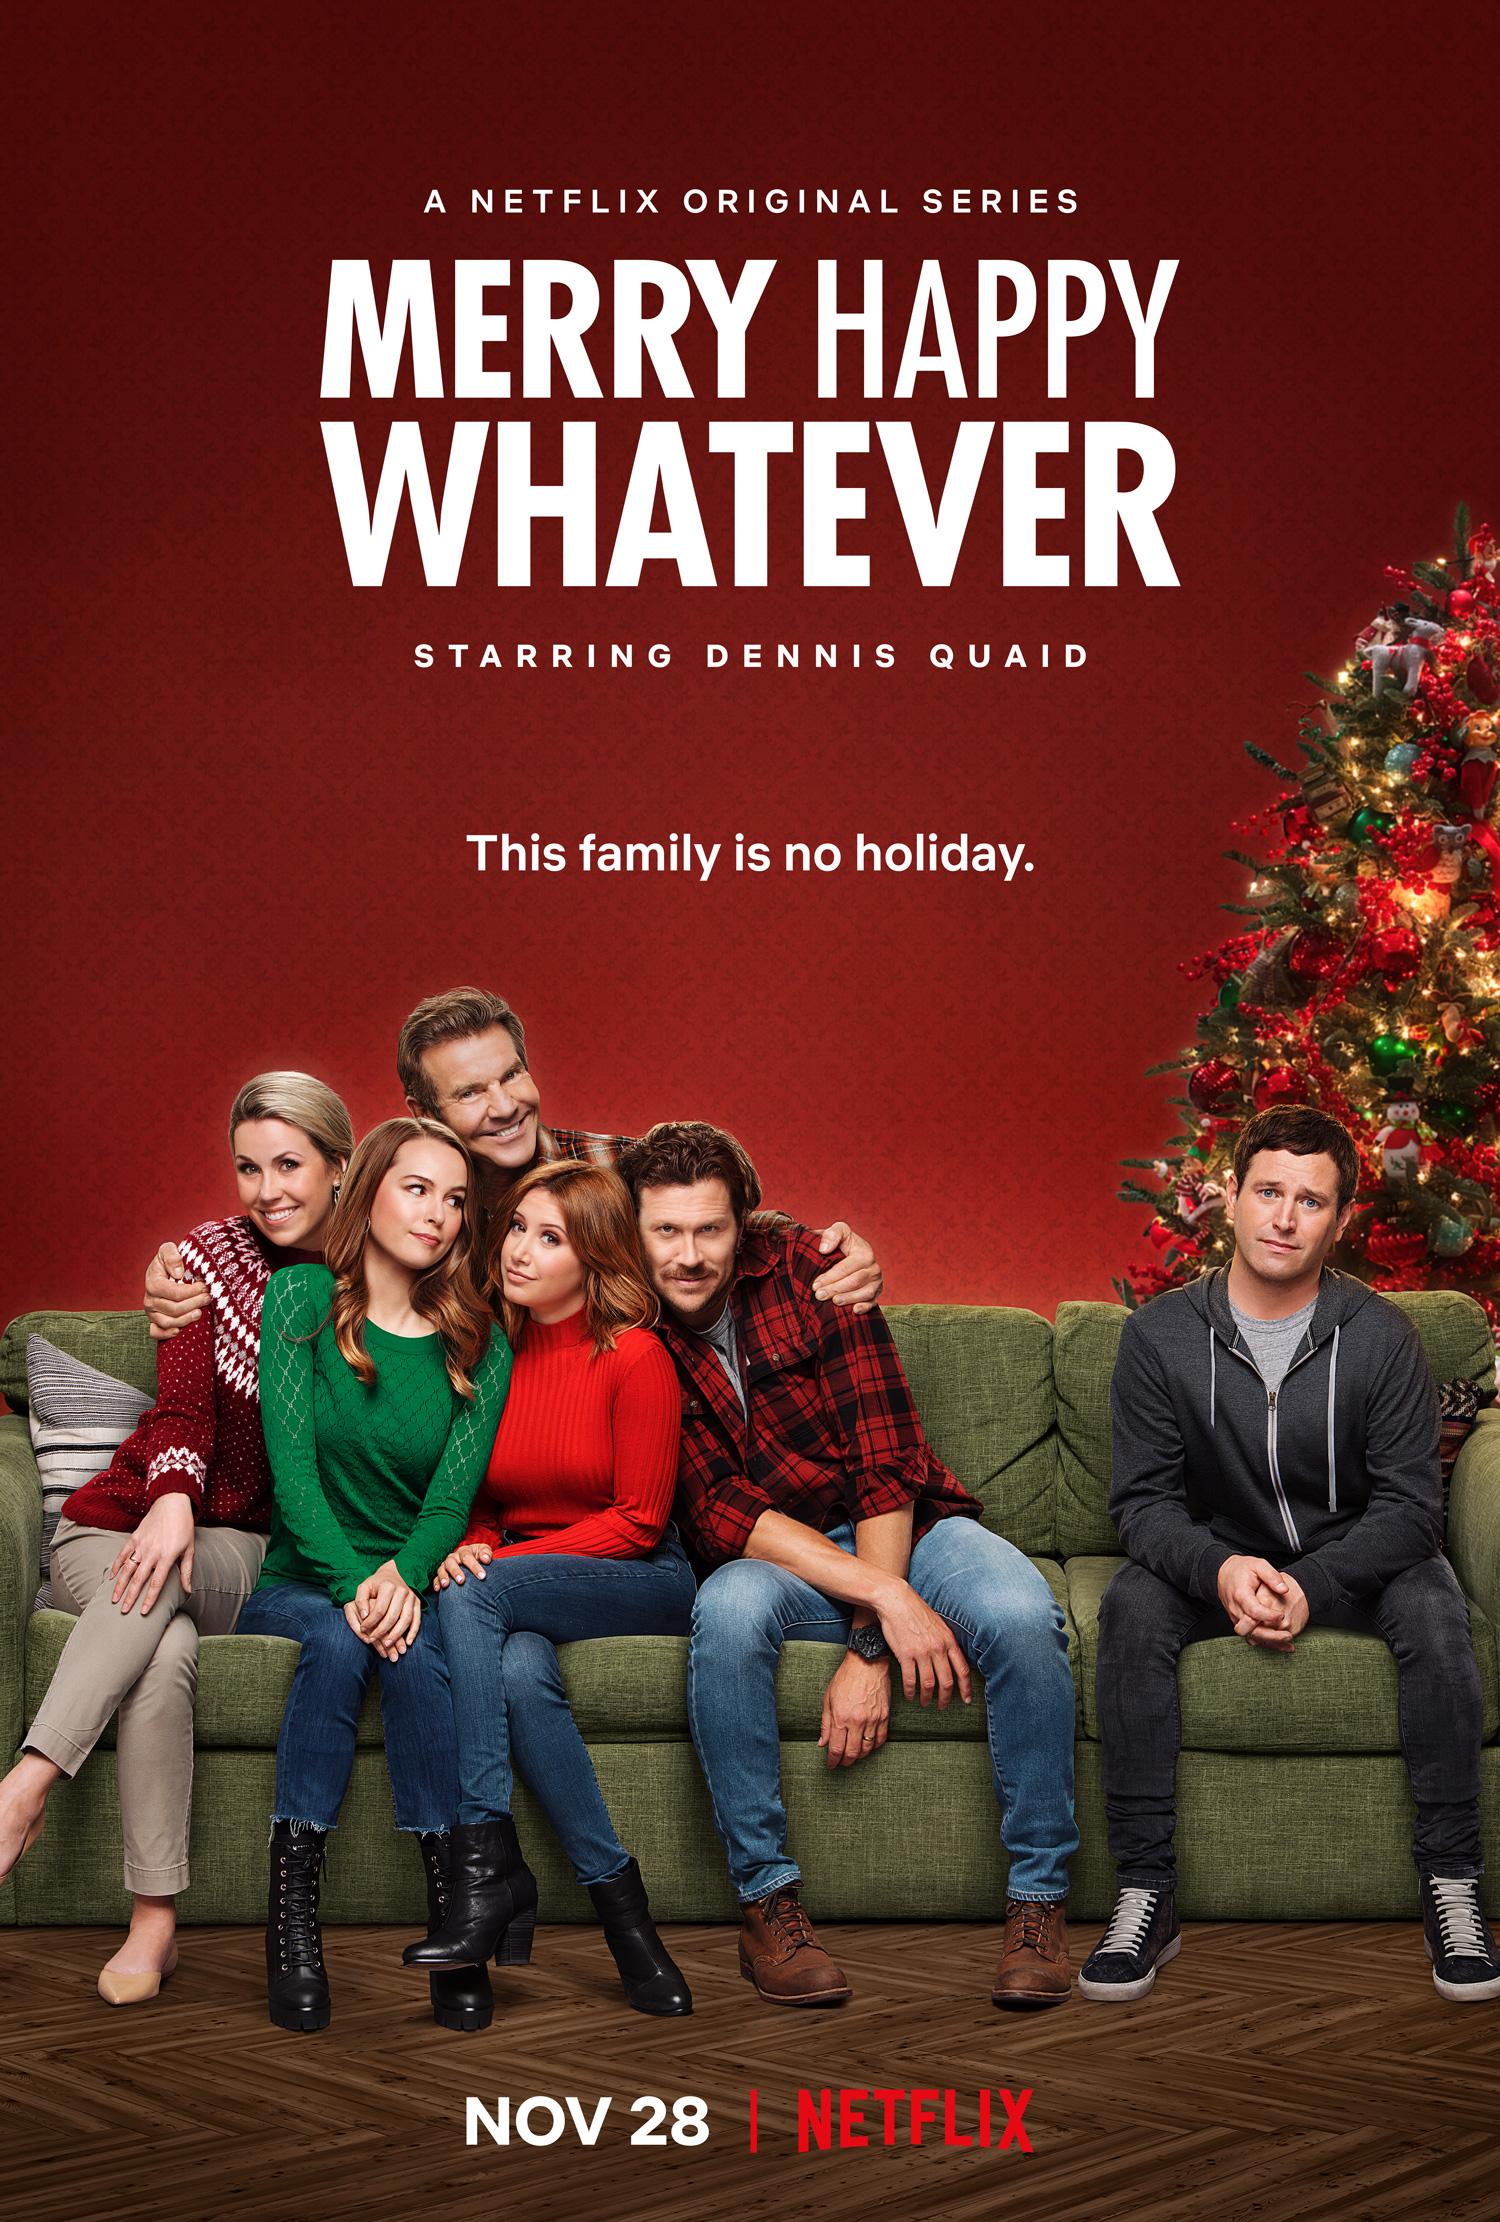 Netflix's Merry Happy Whatever Season 1 Official Trailer